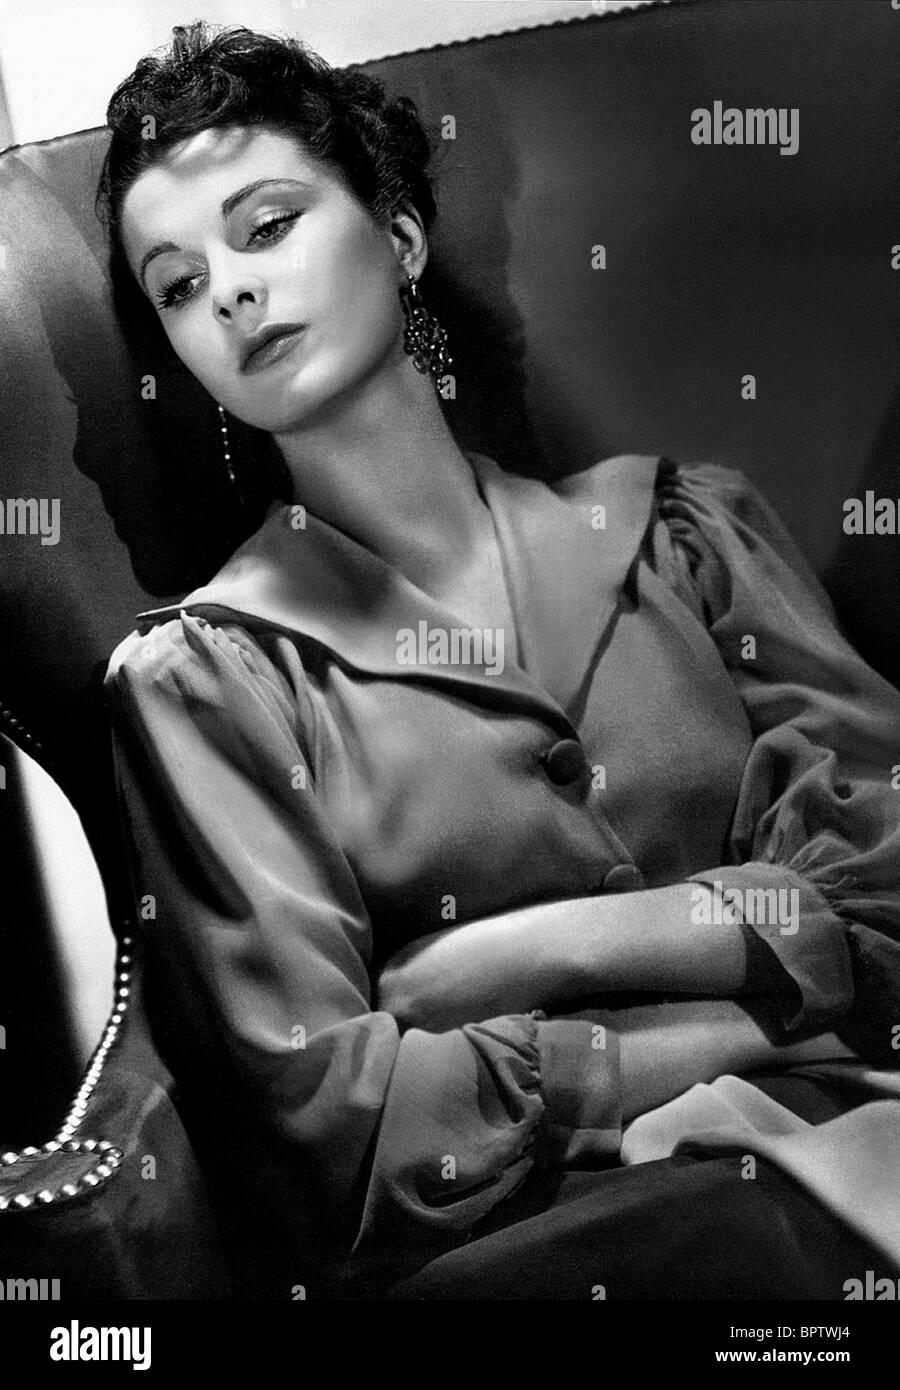 VIVIEN LEIGH ACTRESS (1940) - Stock Image